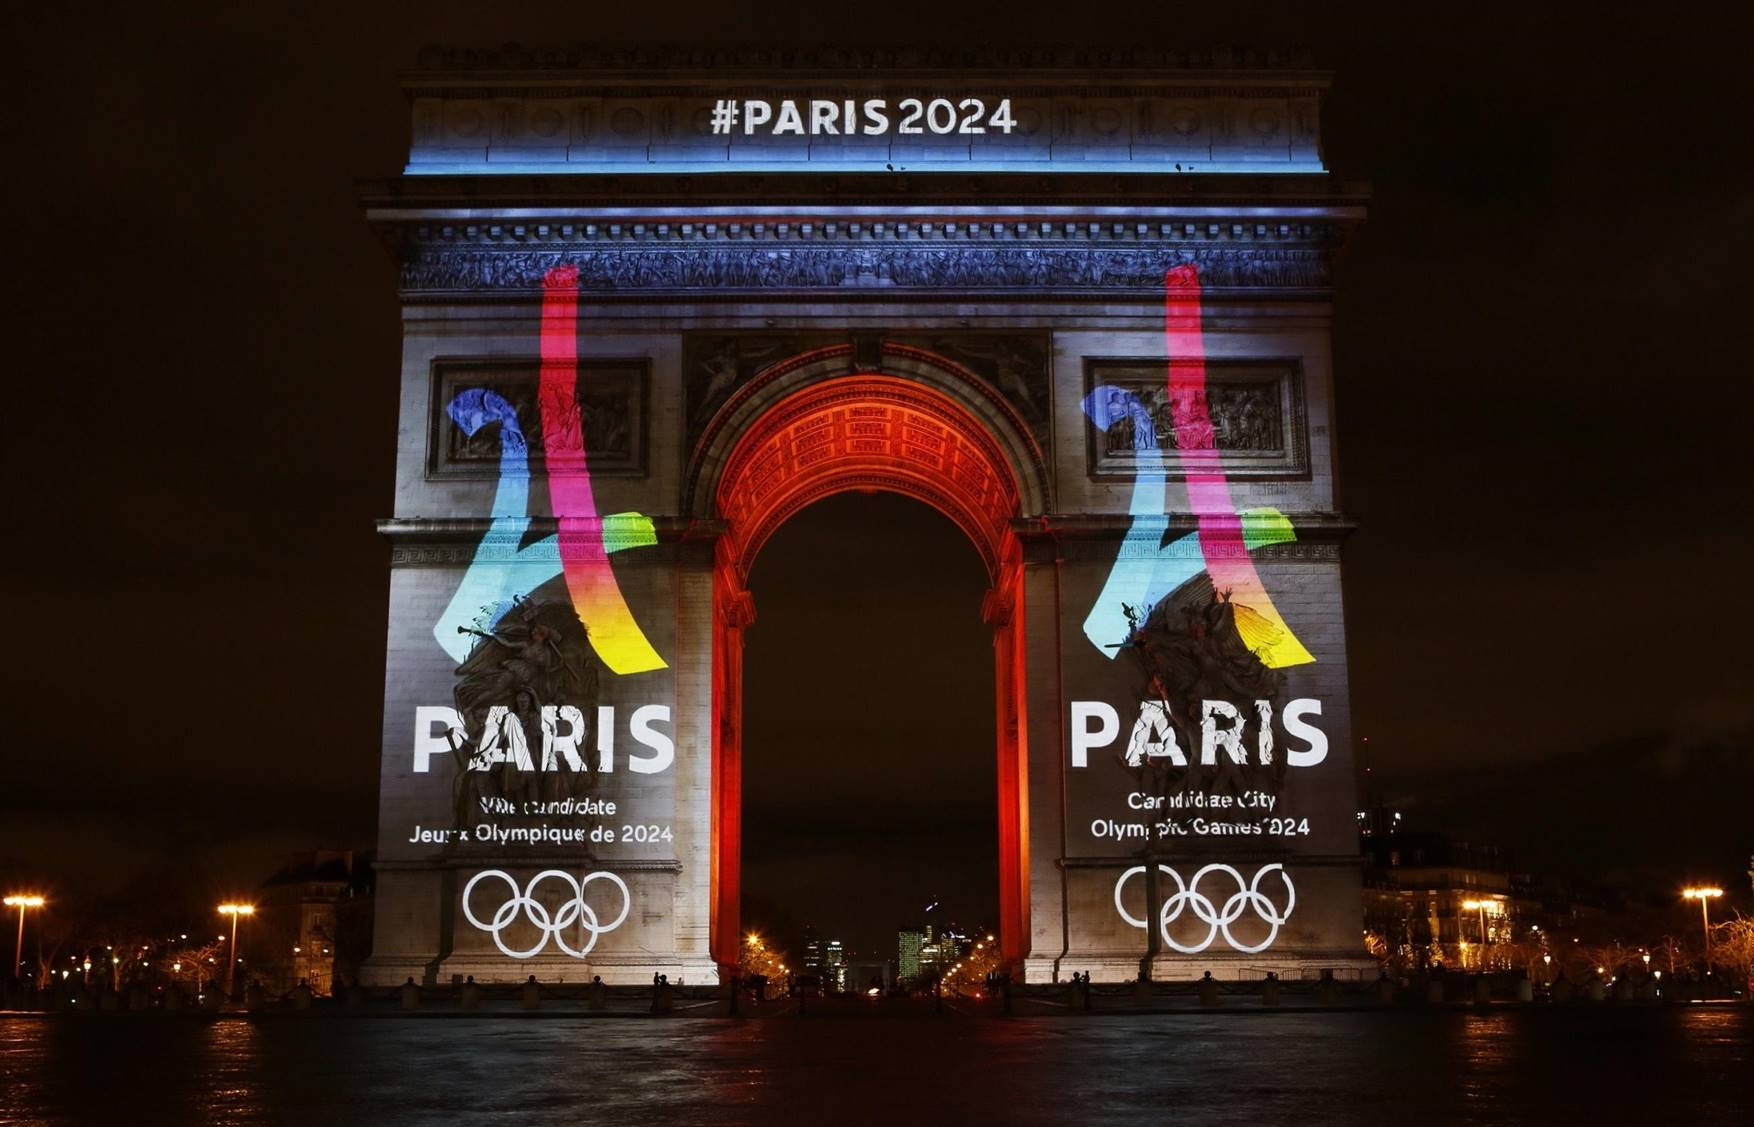 Paris 2024 Olympic Games : Paris keeps collaborating